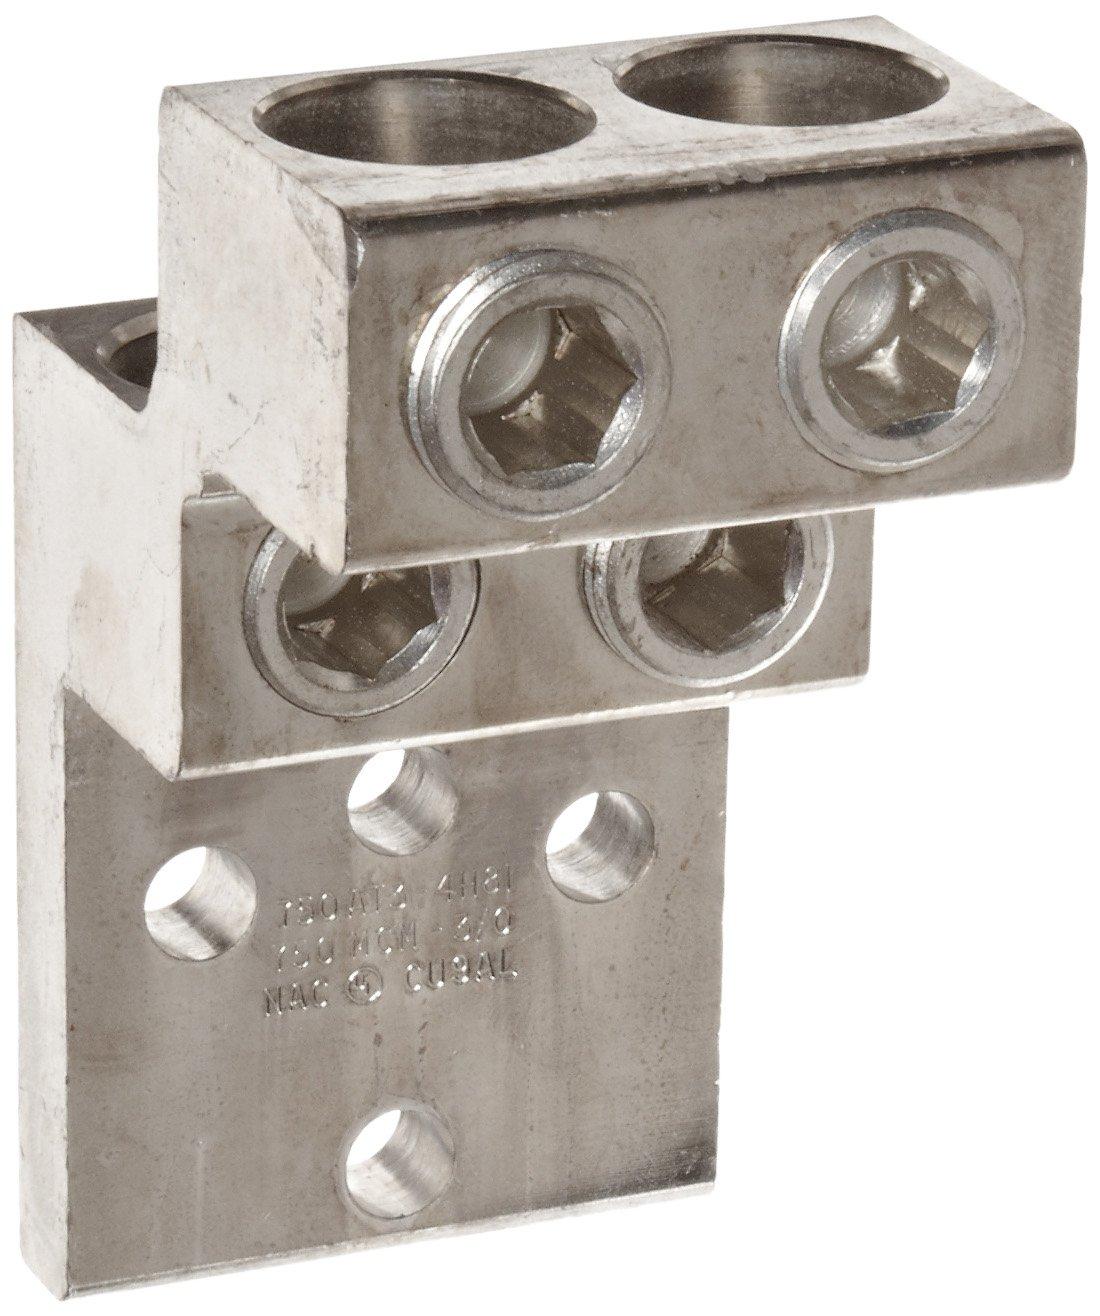 Morris Products 90926 Mechanical Panelboard Lug, Four Conductors, Aluminum, 750 AWG, 750mcm - 3/0STR. Wire Range